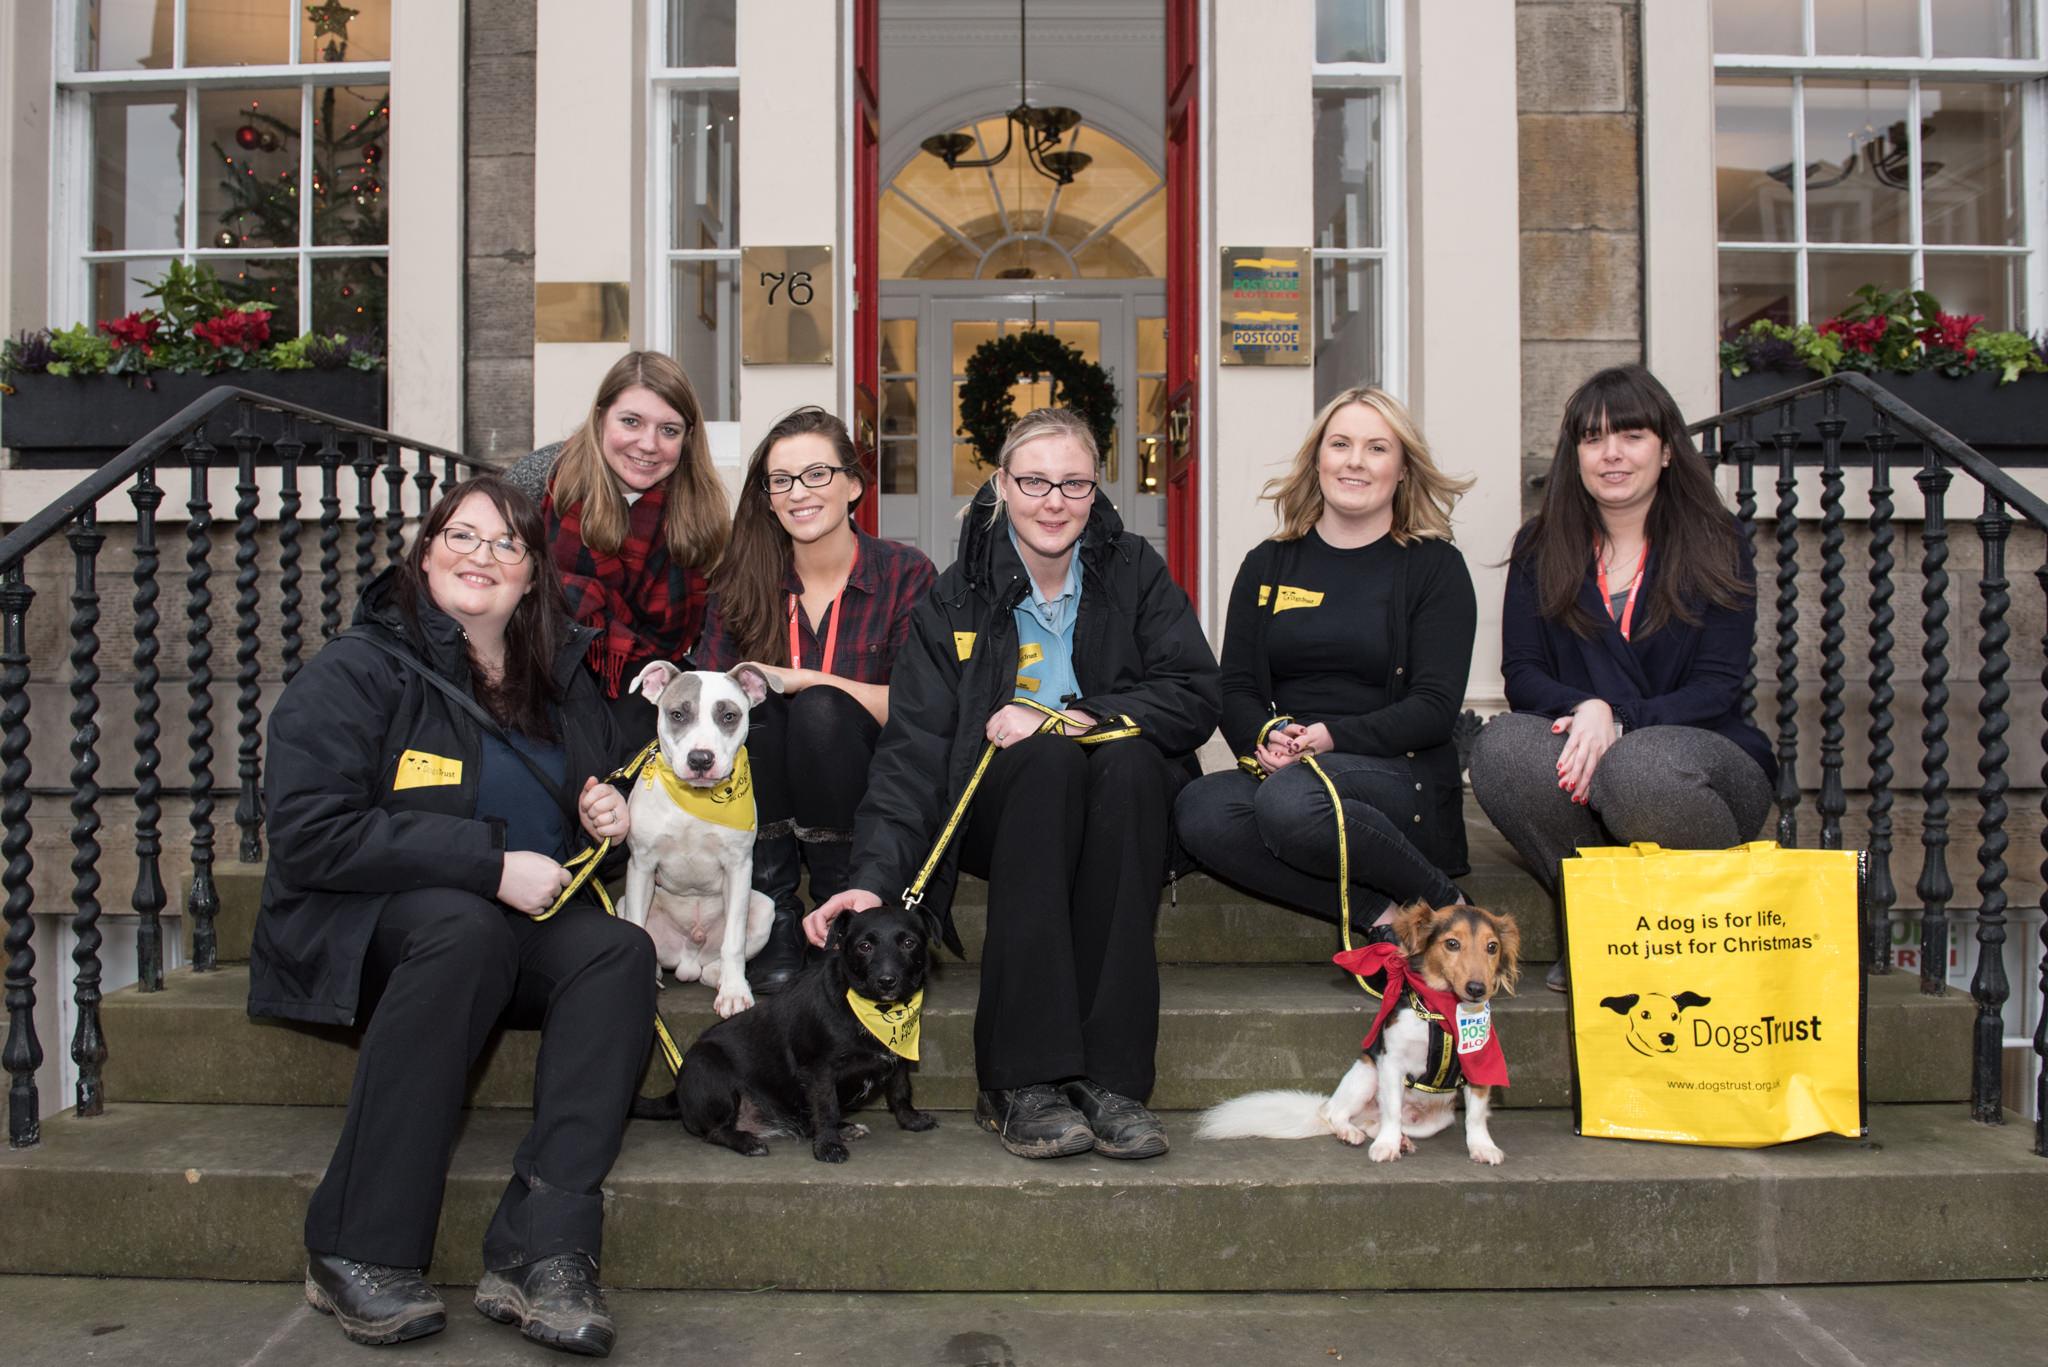 Dogs Trust visit to People's Postcode Lottery - Edinburgh - 15 December 2015 ©Julie Broadfoot - www.juliebee.co.uk